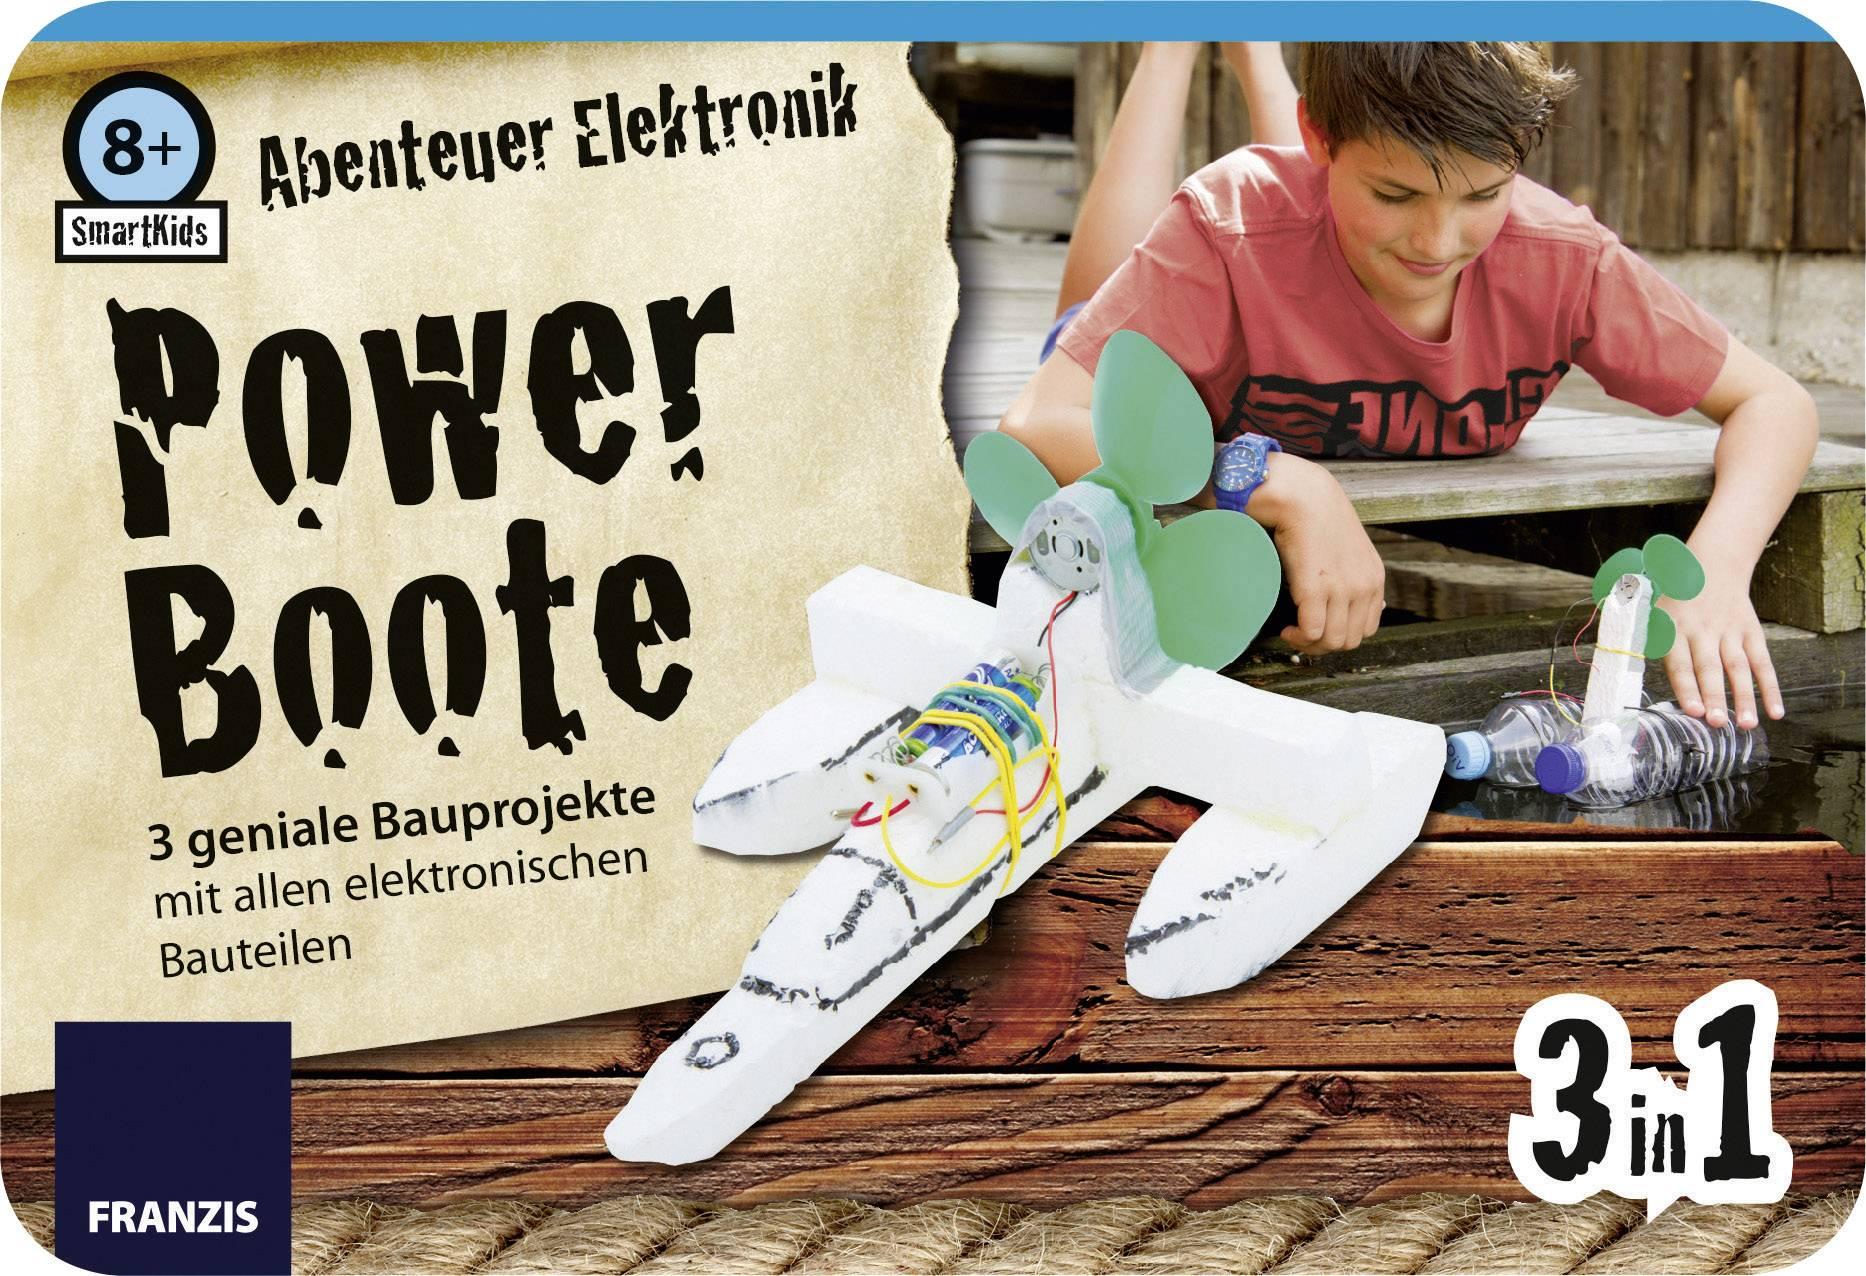 Stavebnica Franzis Verlag SmartKids Abenteuer Elektronik Power Boote 978-3-645-65212-4, od 8 rokov